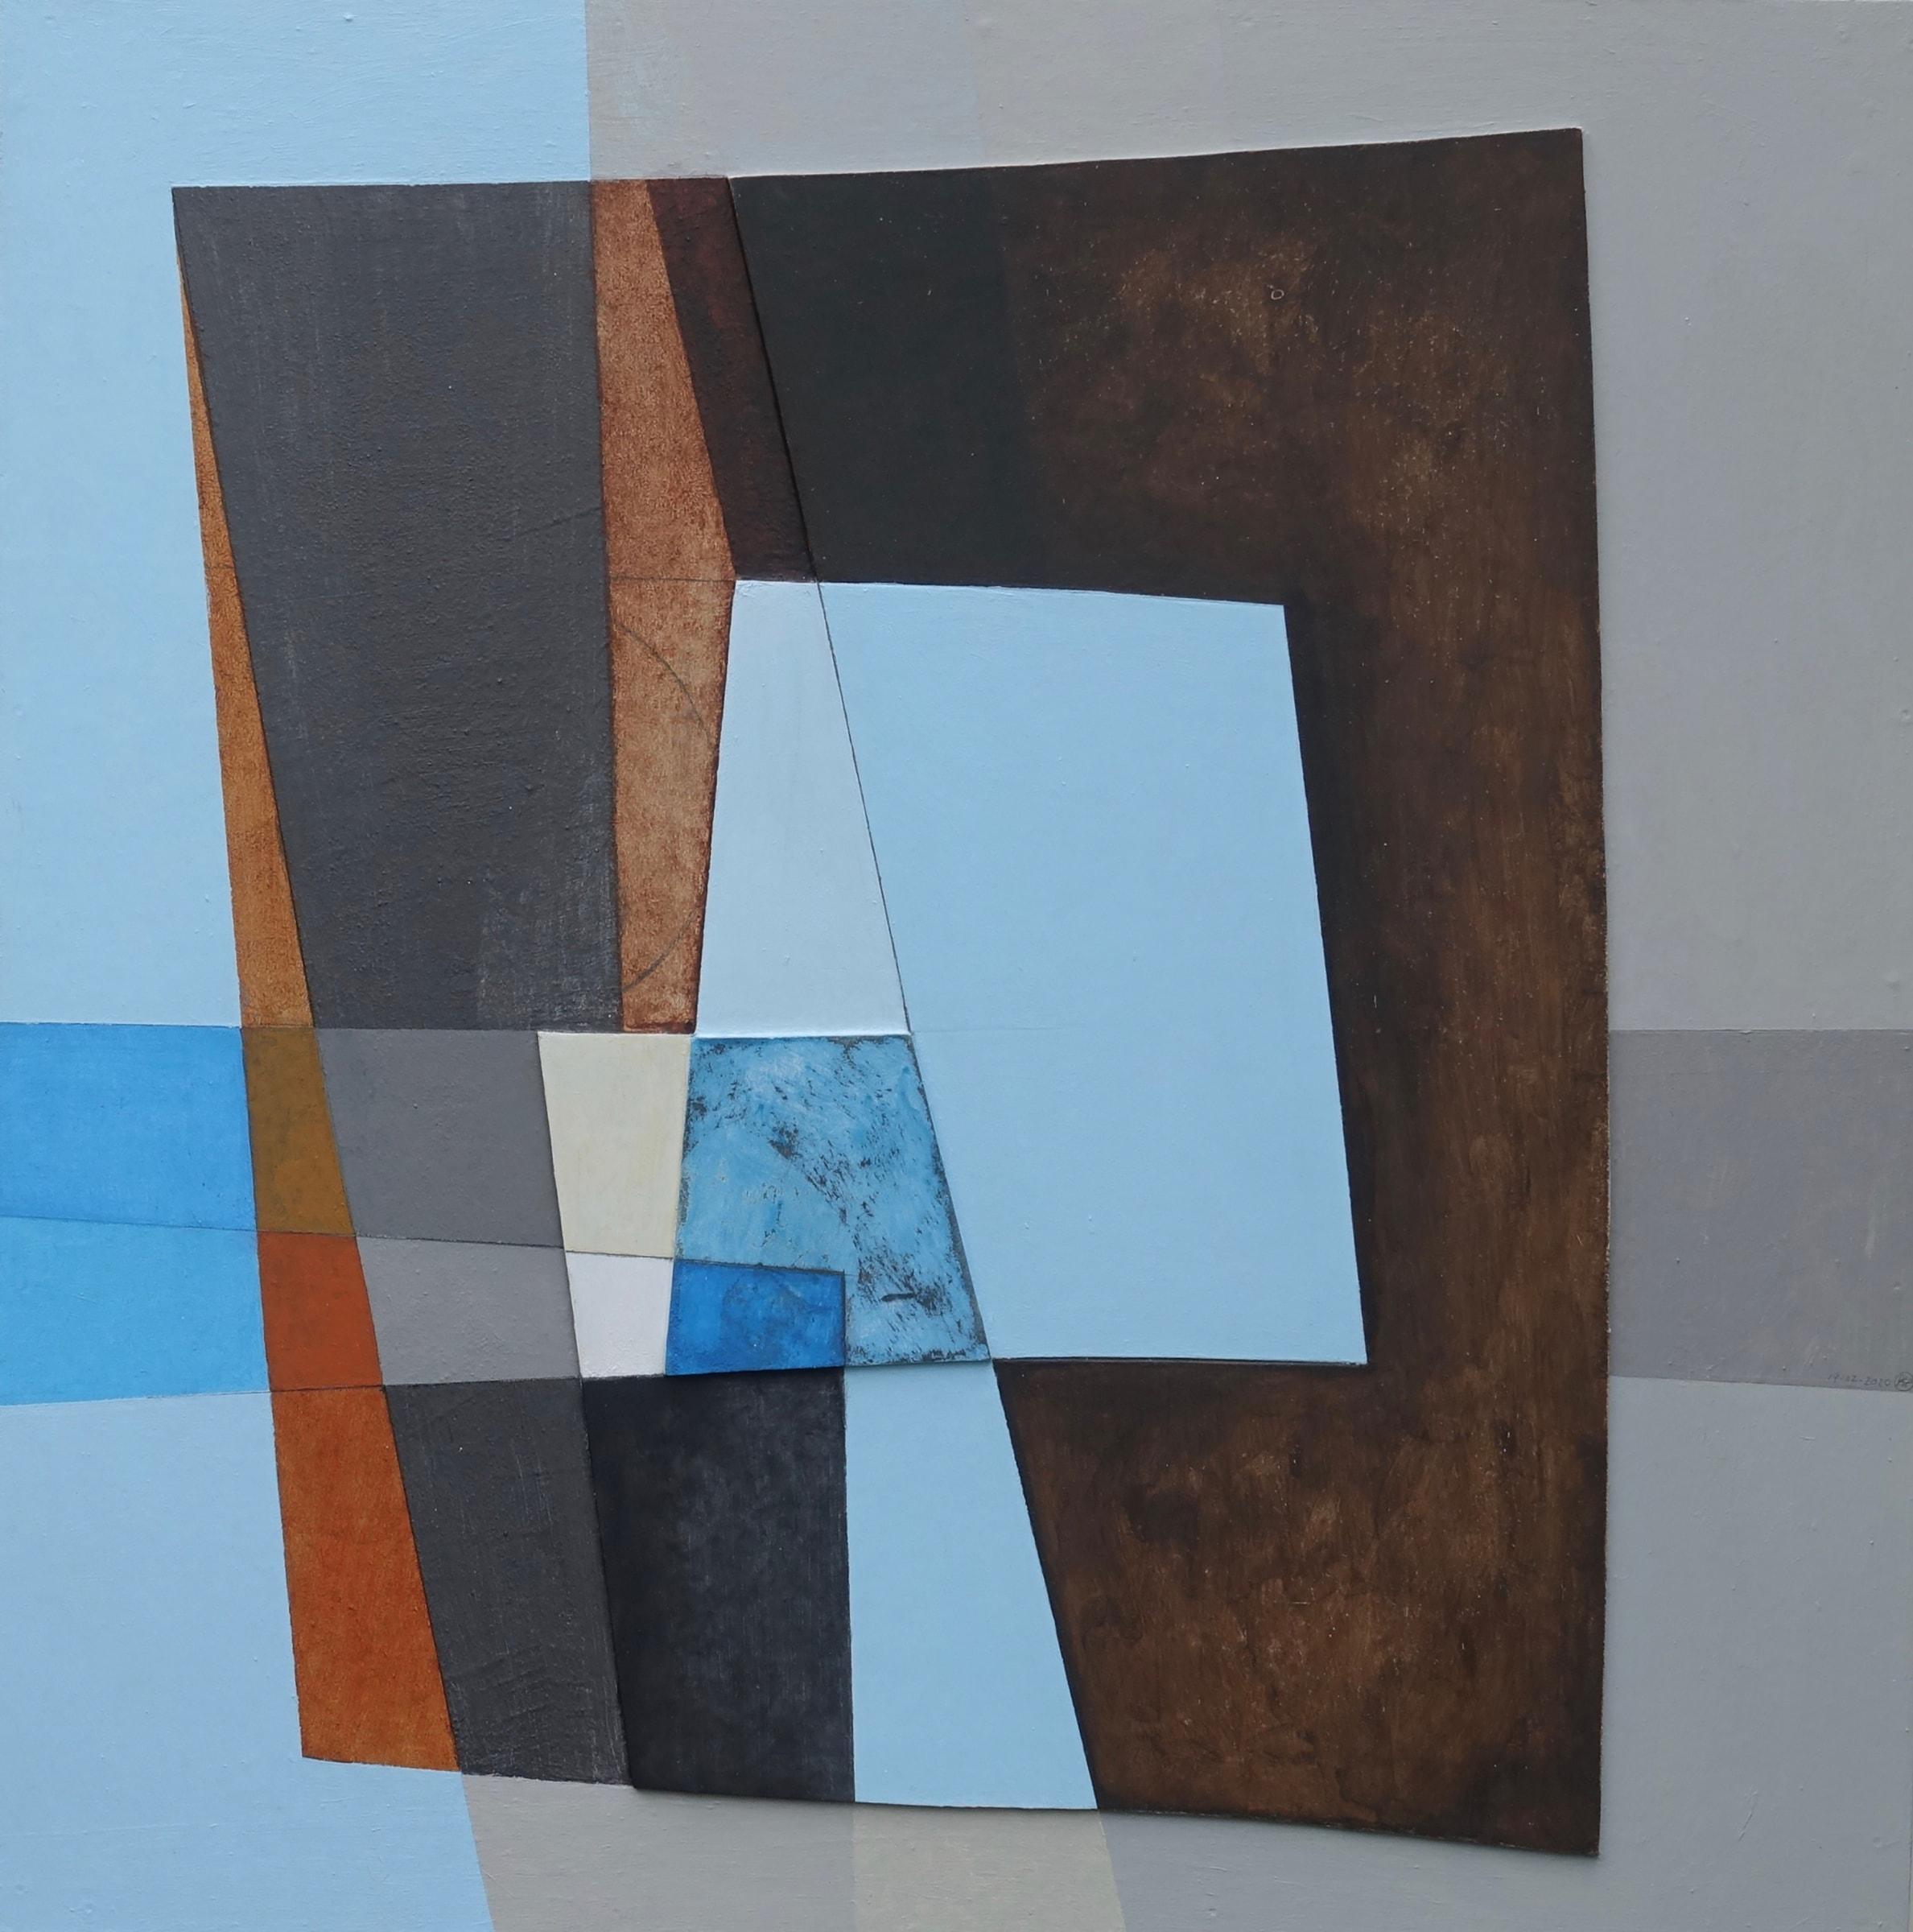 "<span class=""link fancybox-details-link""><a href=""/artists/172-patrick-haughton/works/7214-patrick-haughton-entering-harbour-blue-2020/"">View Detail Page</a></span><div class=""artist""><strong>Patrick Haughton</strong></div> b. 1942 <div class=""title""><em>Entering Harbour: Blue</em>, 2020</div> <div class=""medium"">carved relief on board/acrylic</div> <div class=""dimensions"">72 x 72 cm</div><div class=""price"">£1,950.00</div><div class=""copyright_line"">Own Art: £195 x 10 months, 0% APR</div>"